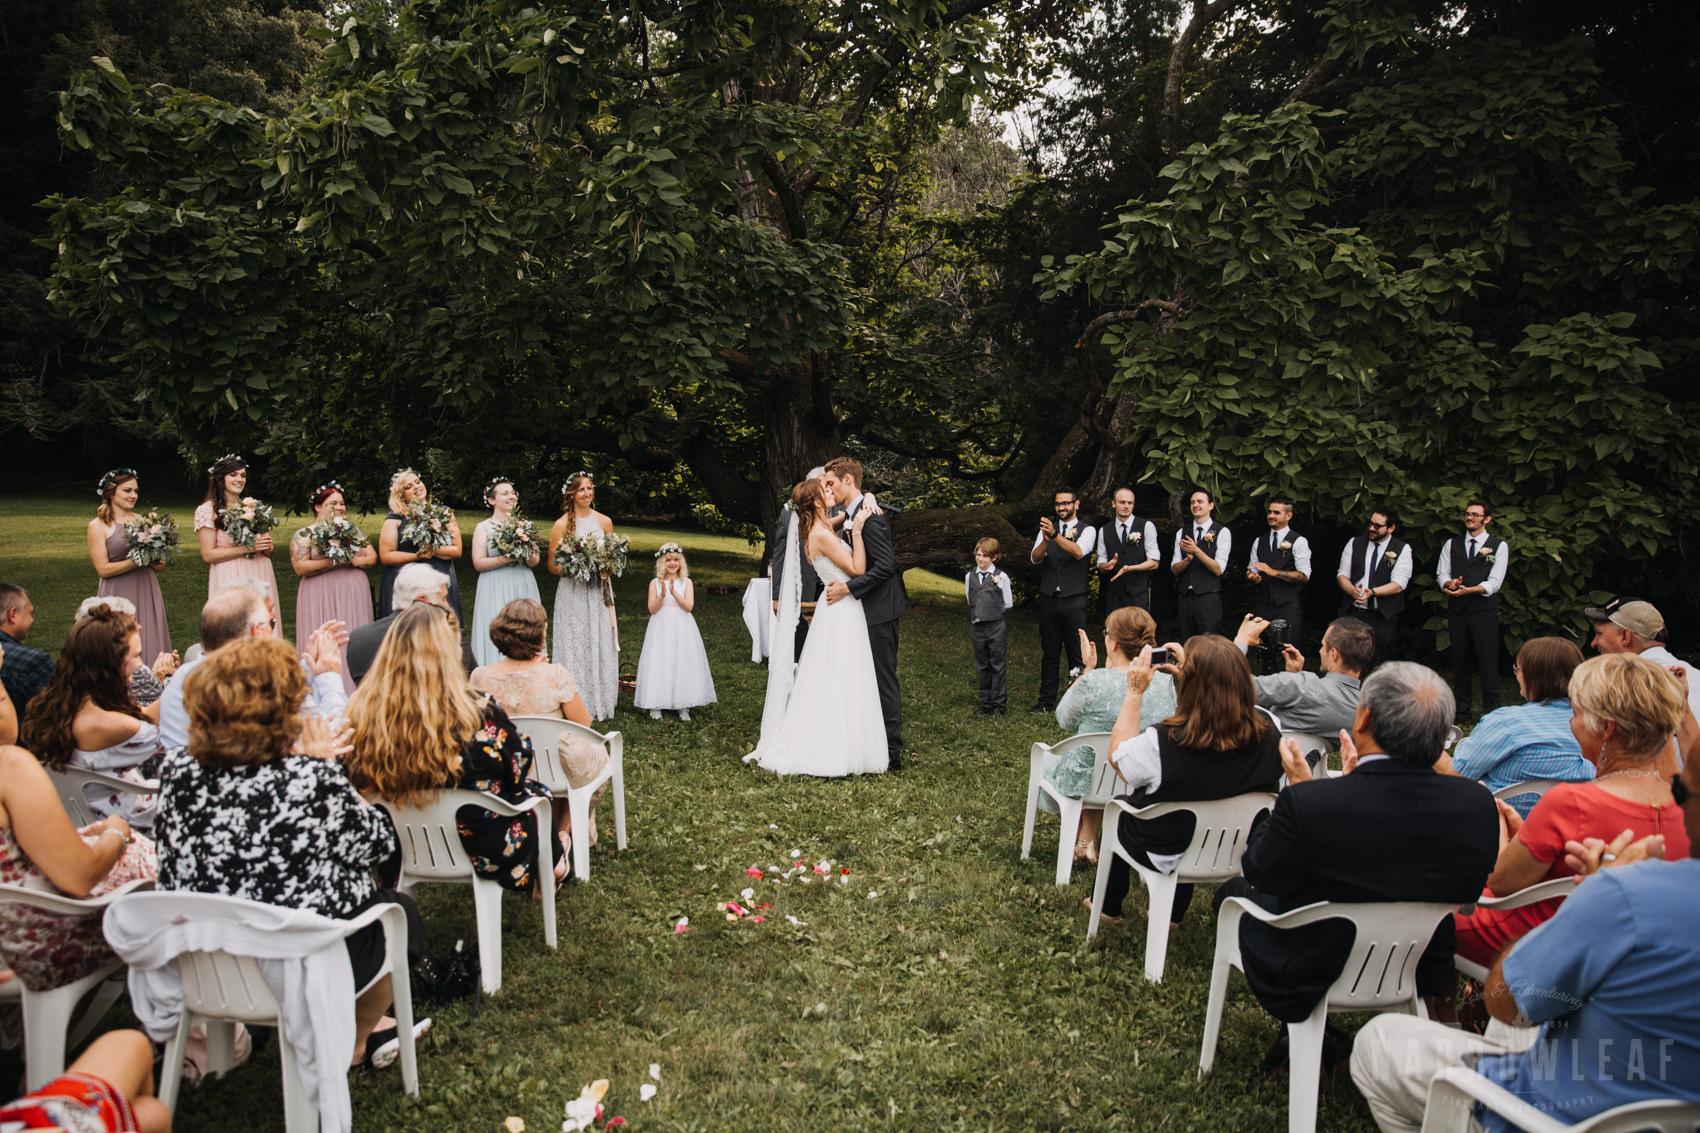 Hilltop in spring green wedding ceremony